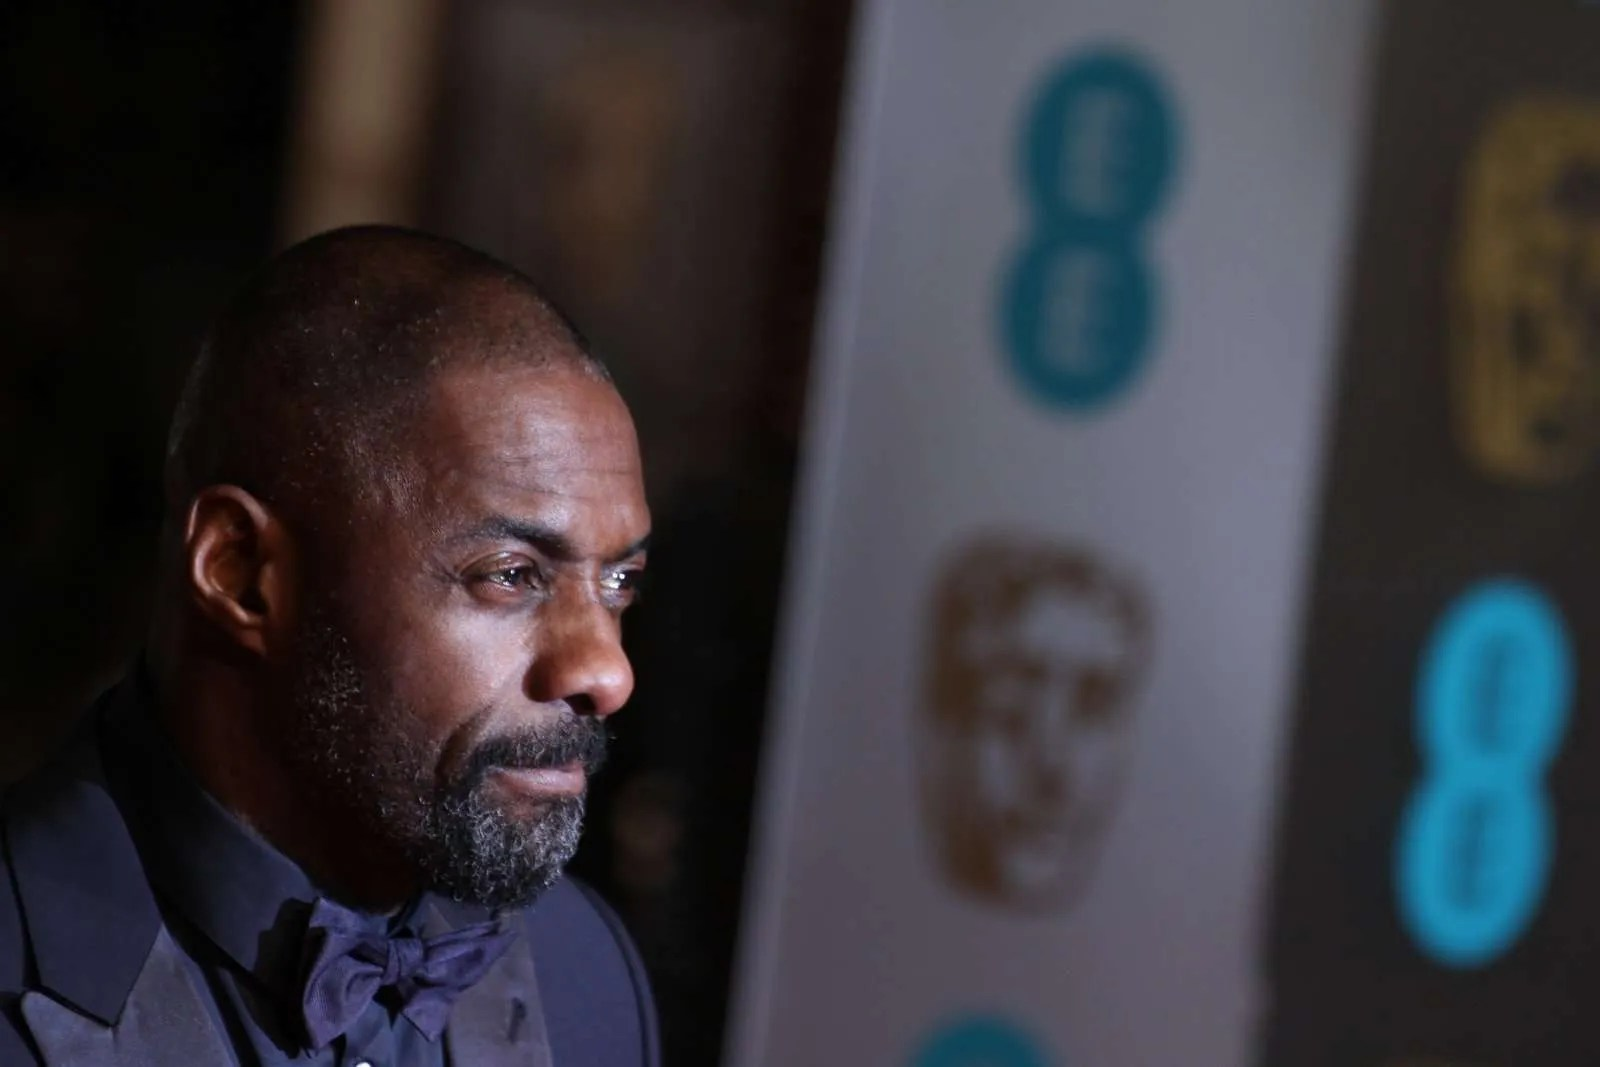 London, Idris Elba has opened a wine shop in King's Cross thumbnail